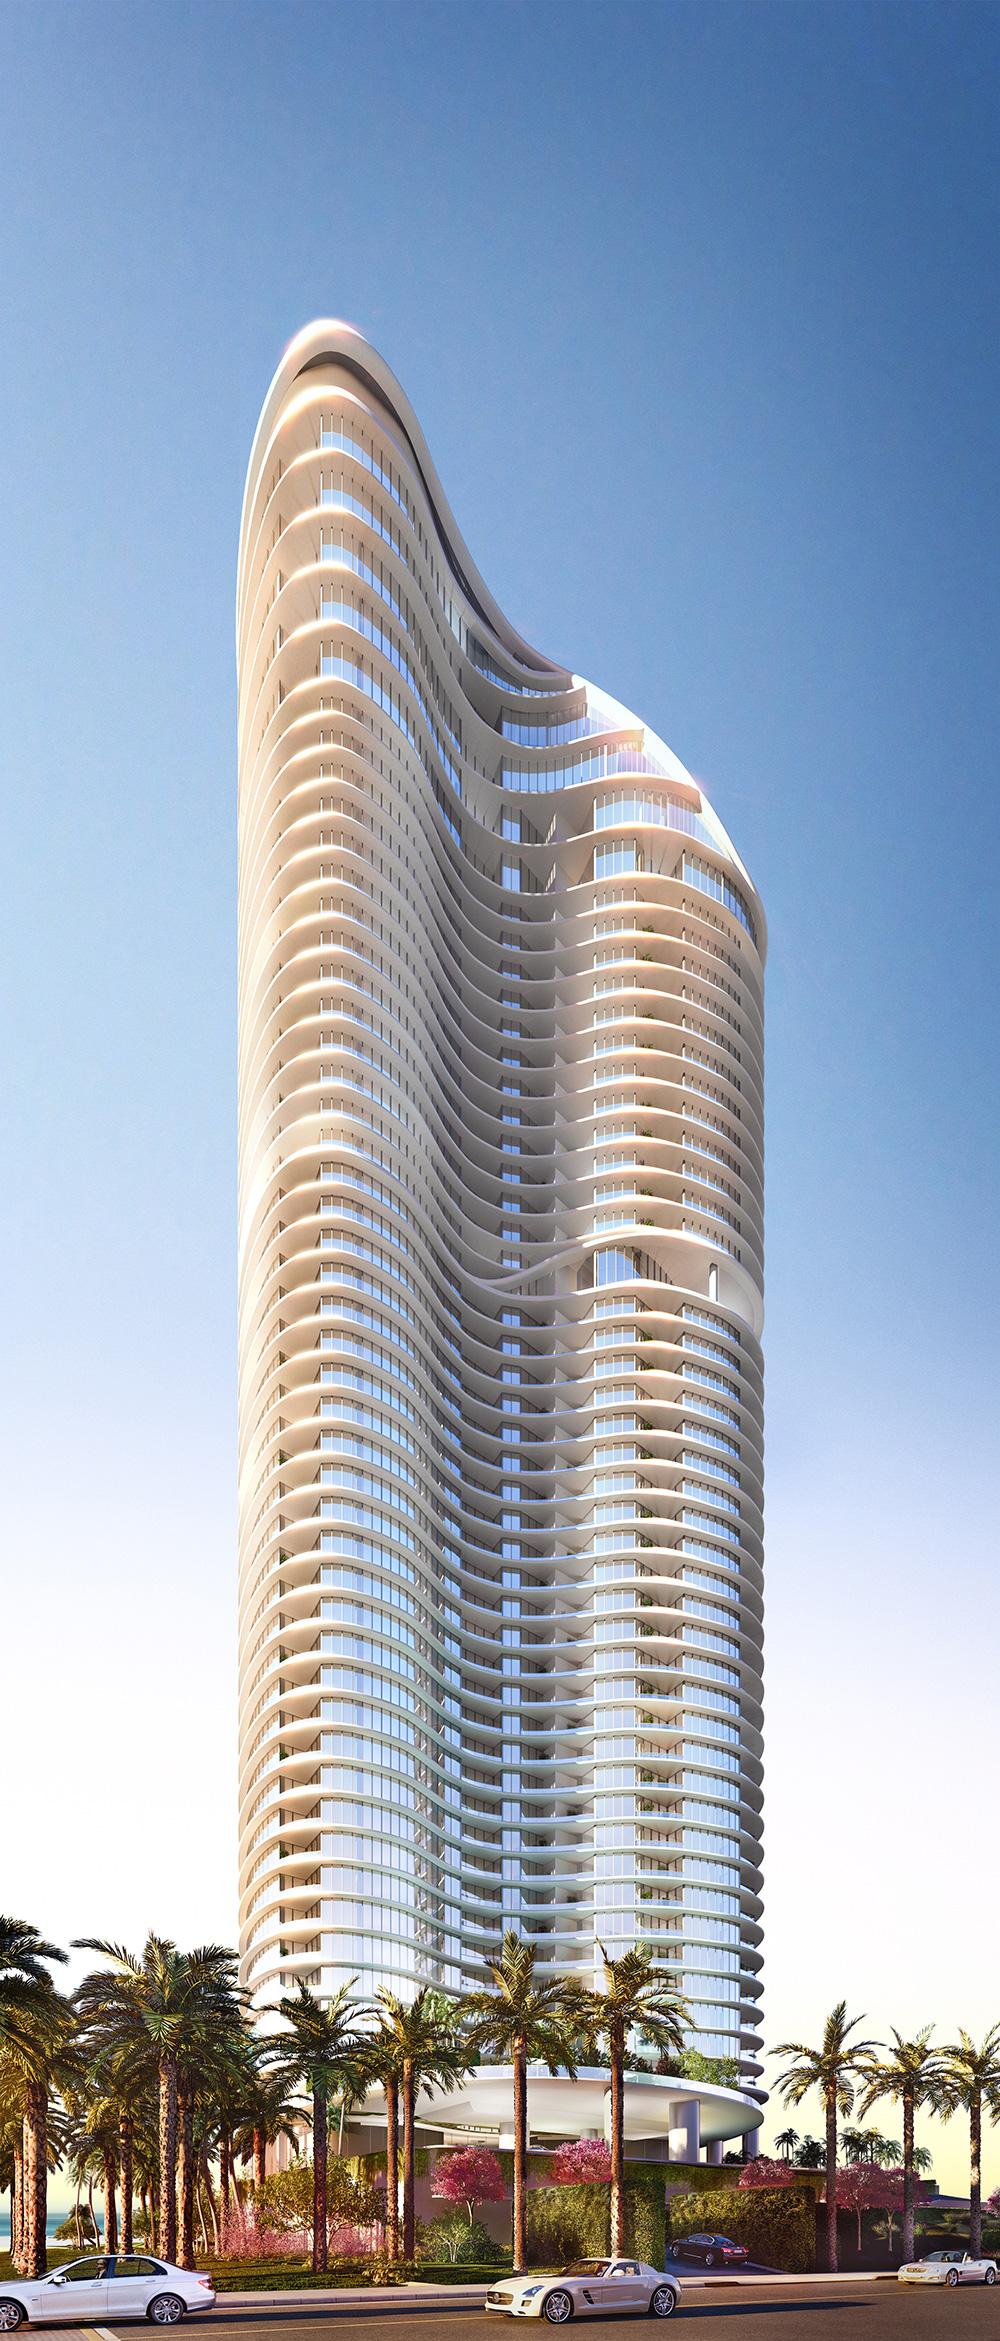 condominiums-for-sale-in-miami-the-building-east-ritz-carlton-sunny-isles-full.jpg